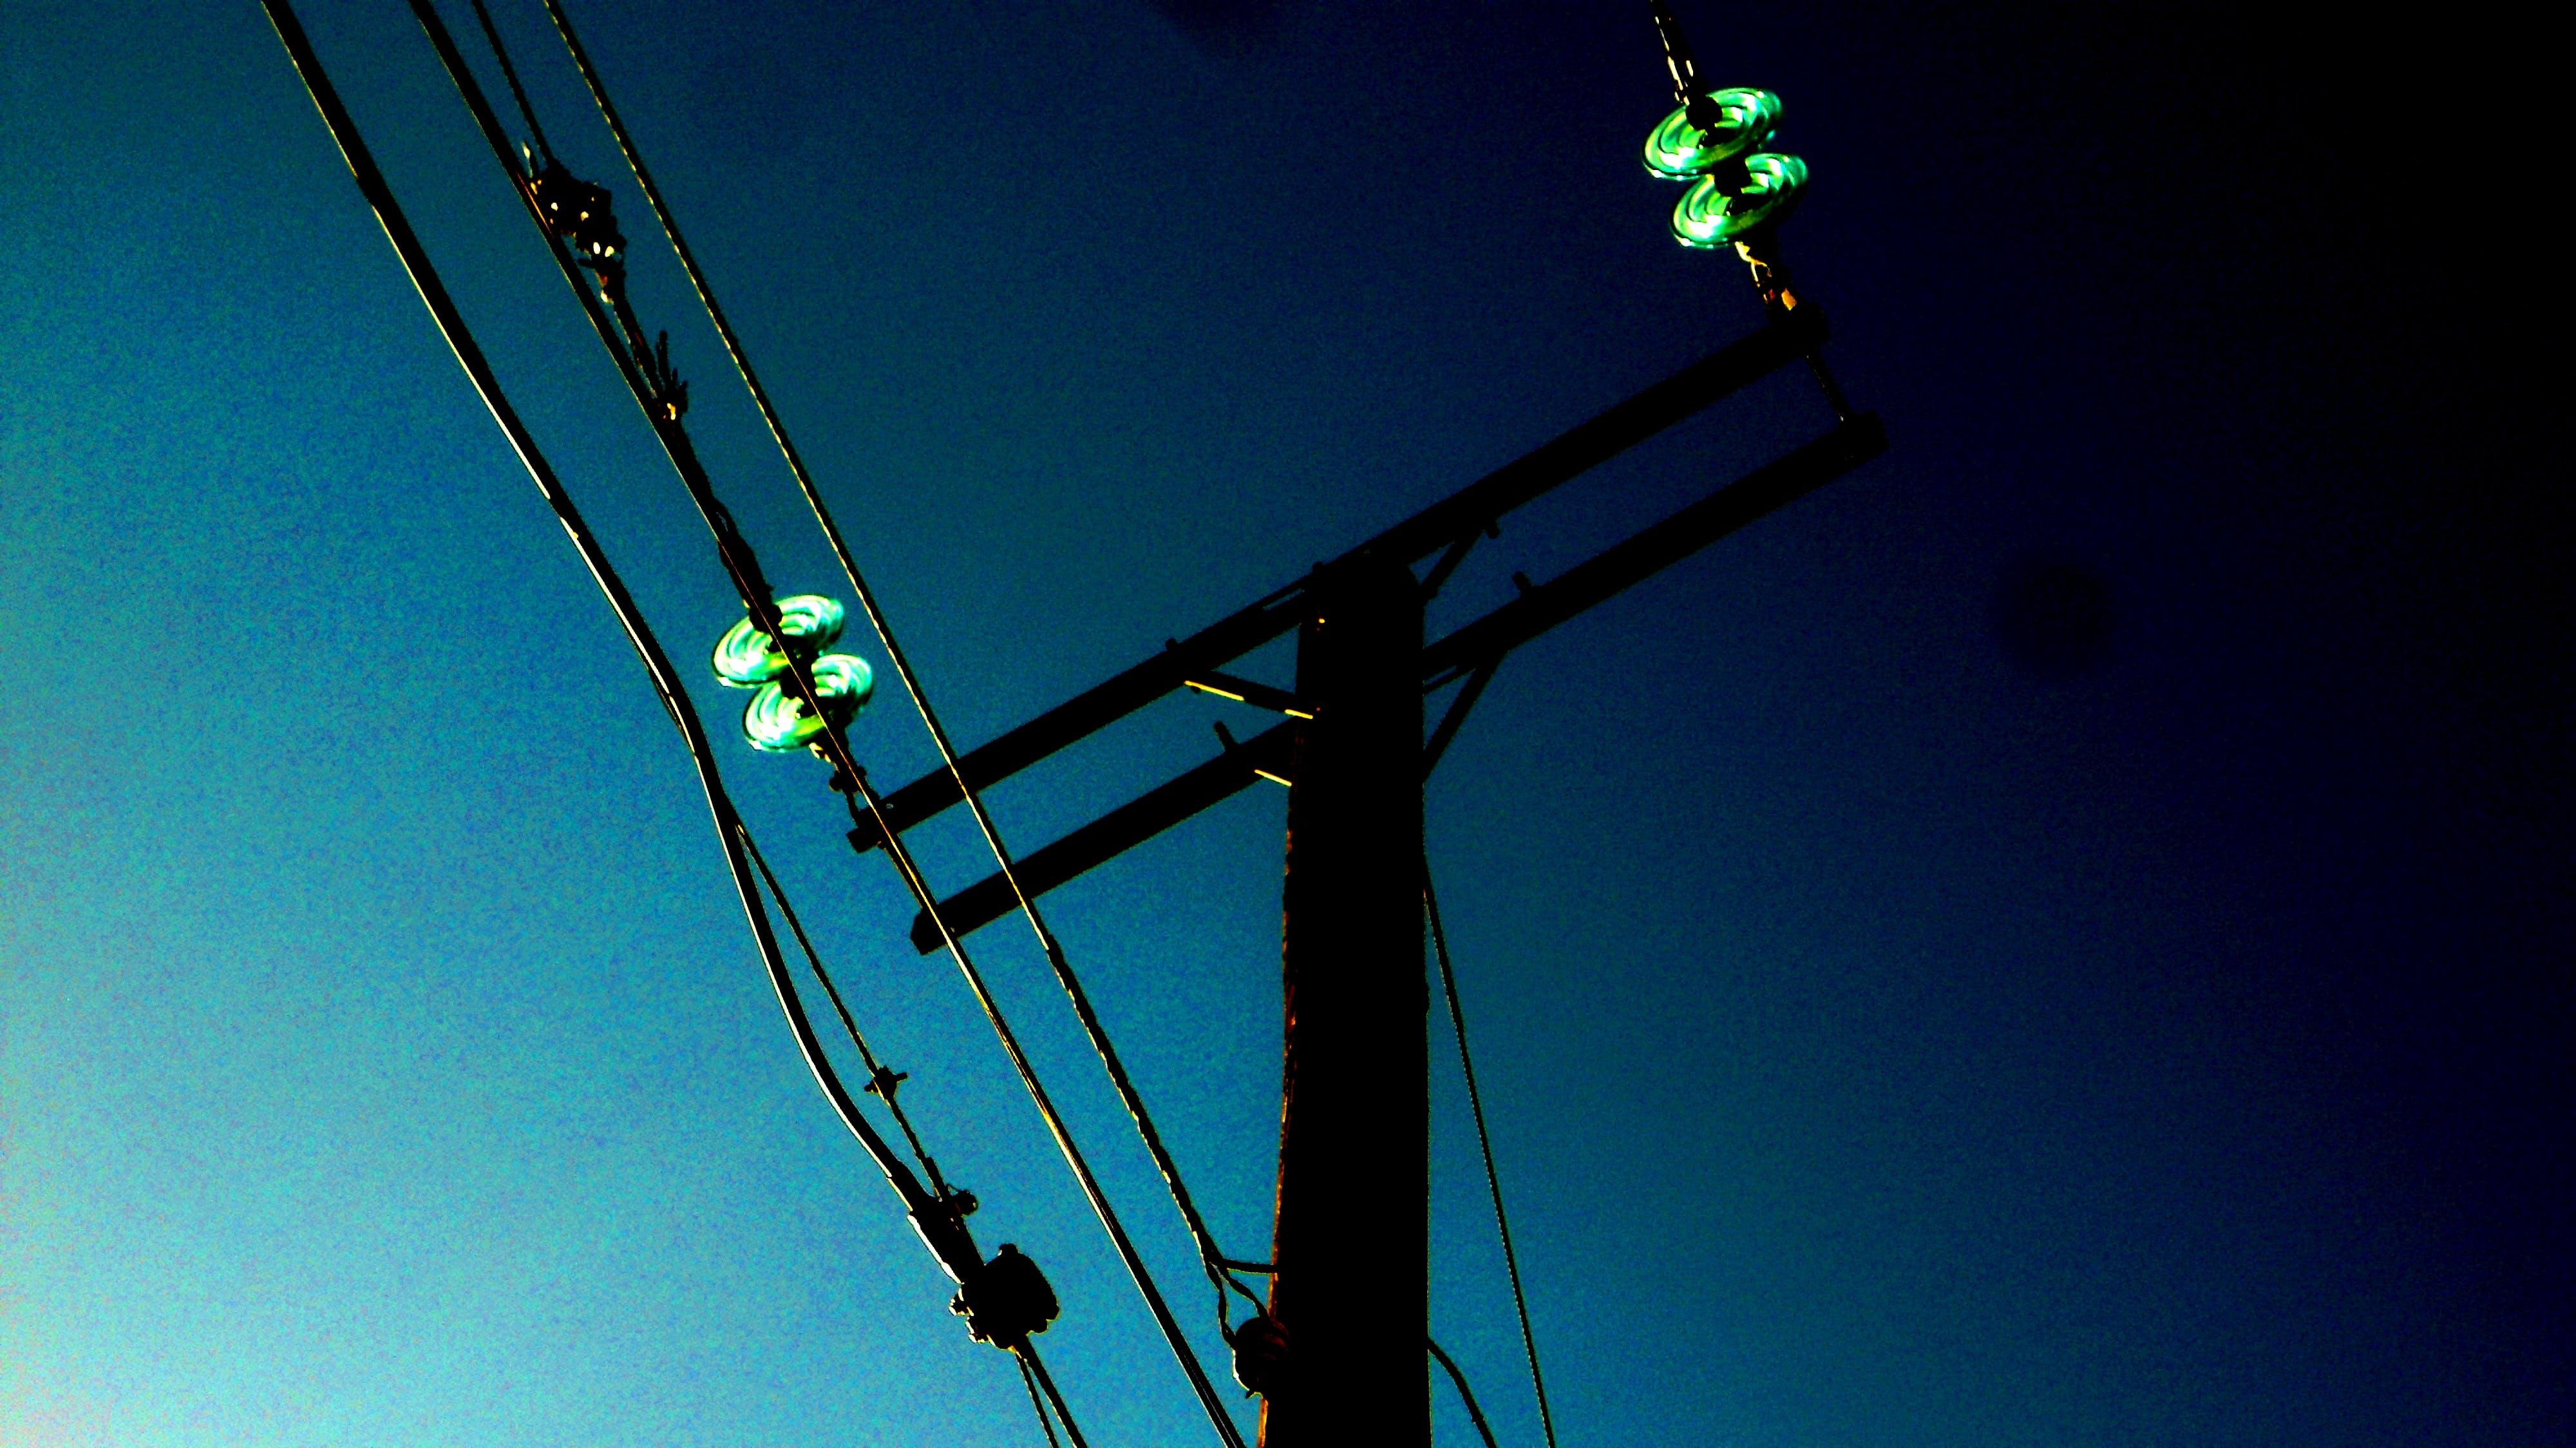 Free stock photo of Electricidad, energia, poste